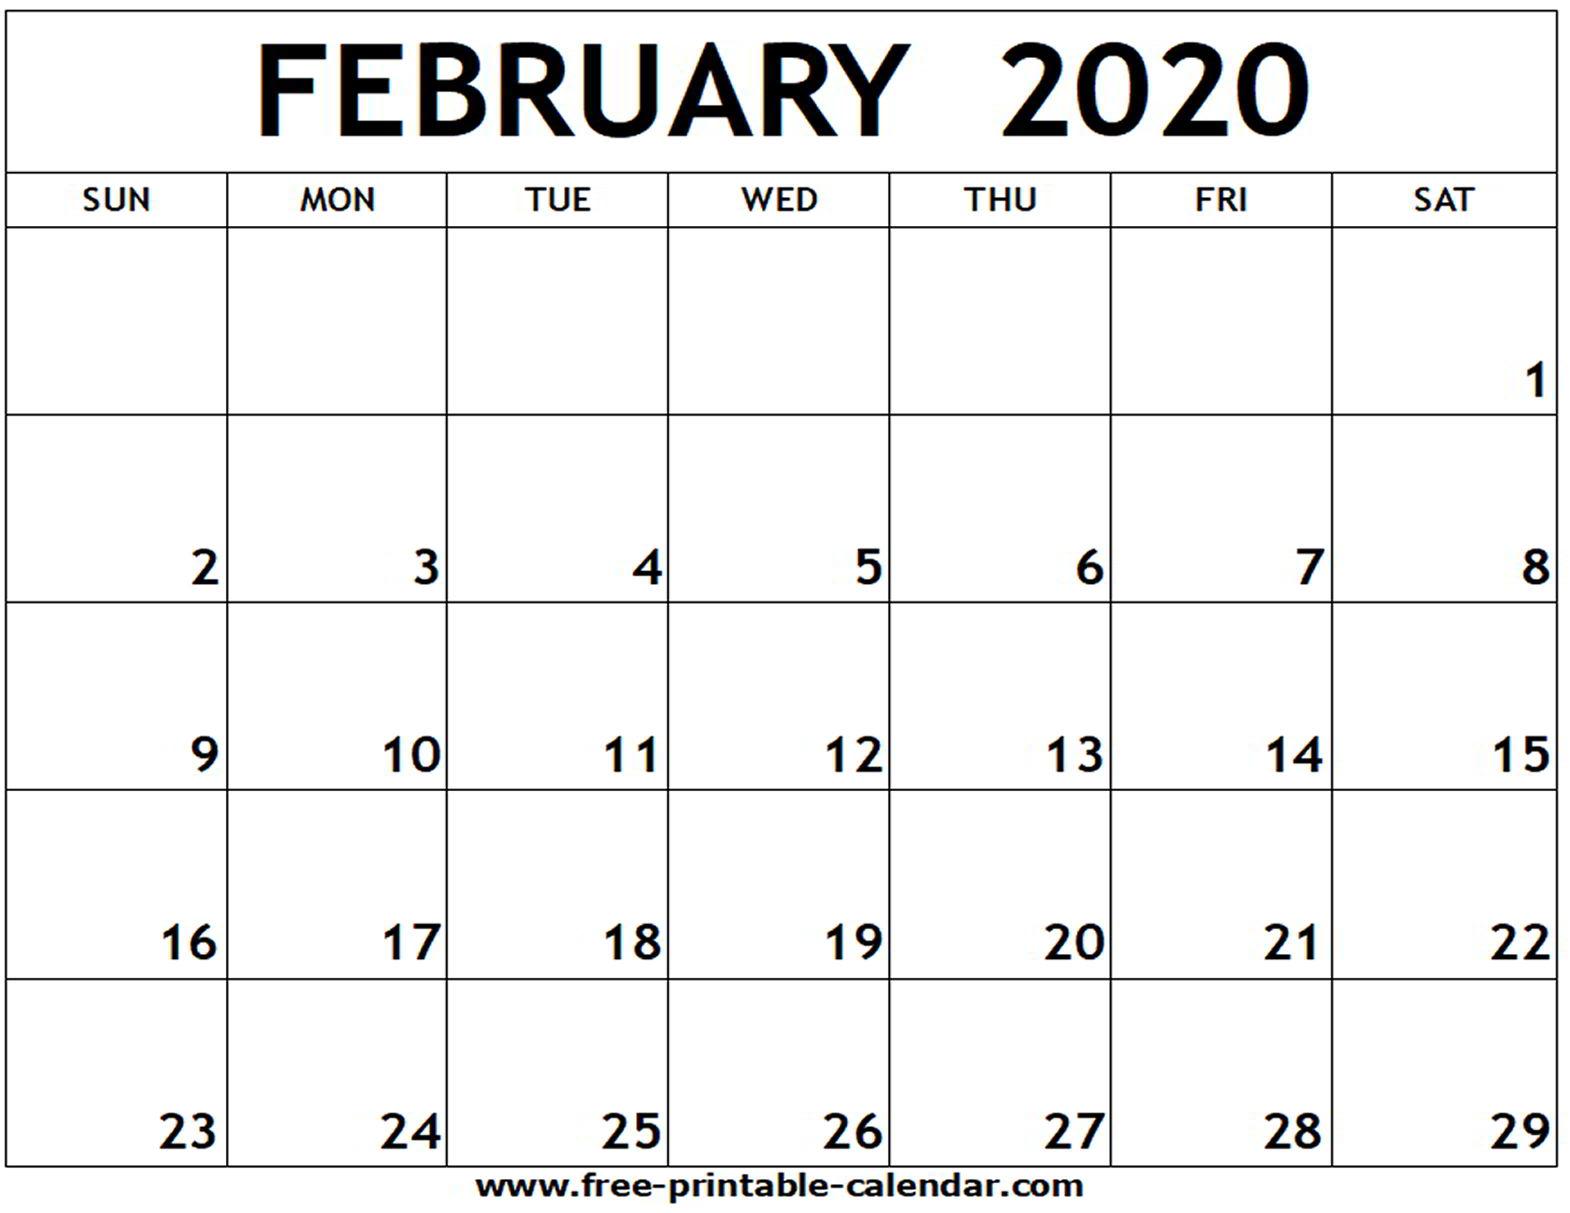 February 2020 Printable Calendar - Free-Printable-Calendar